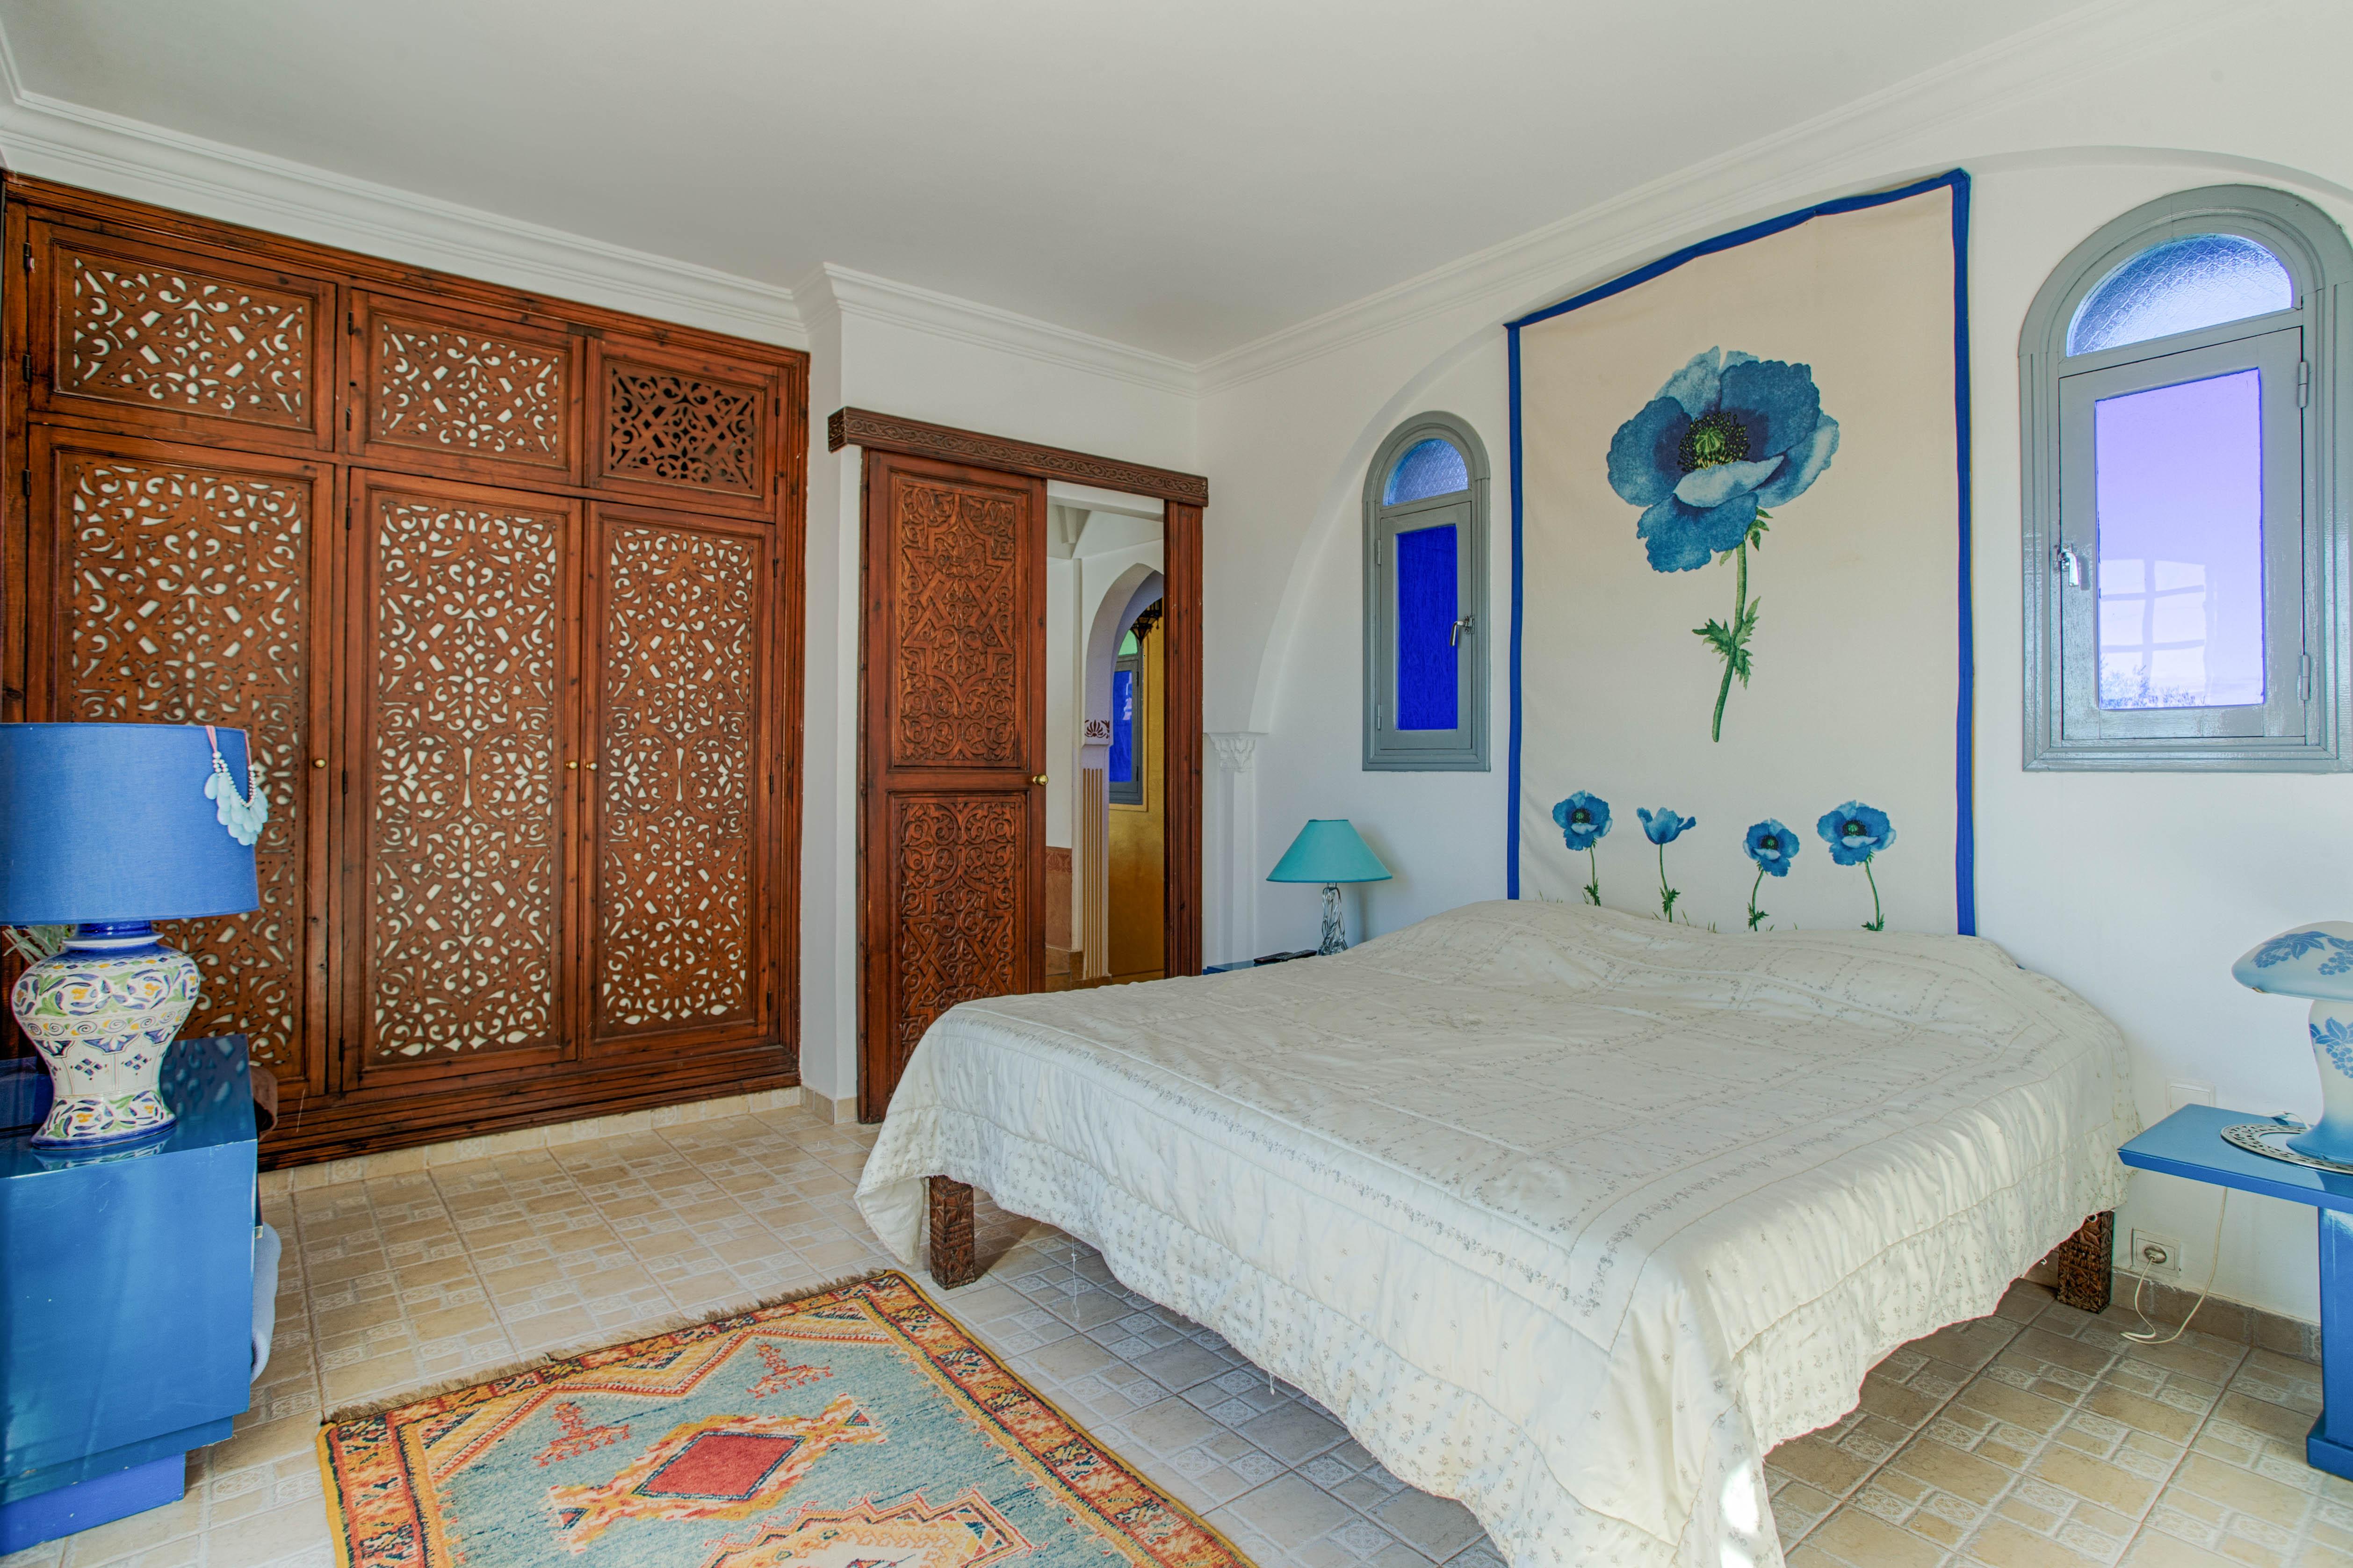 Apartment VILLA LES OLIVIERS - SPLENDIDE VILLA AVEC PISCINE A MARRAKECH photo 20238874